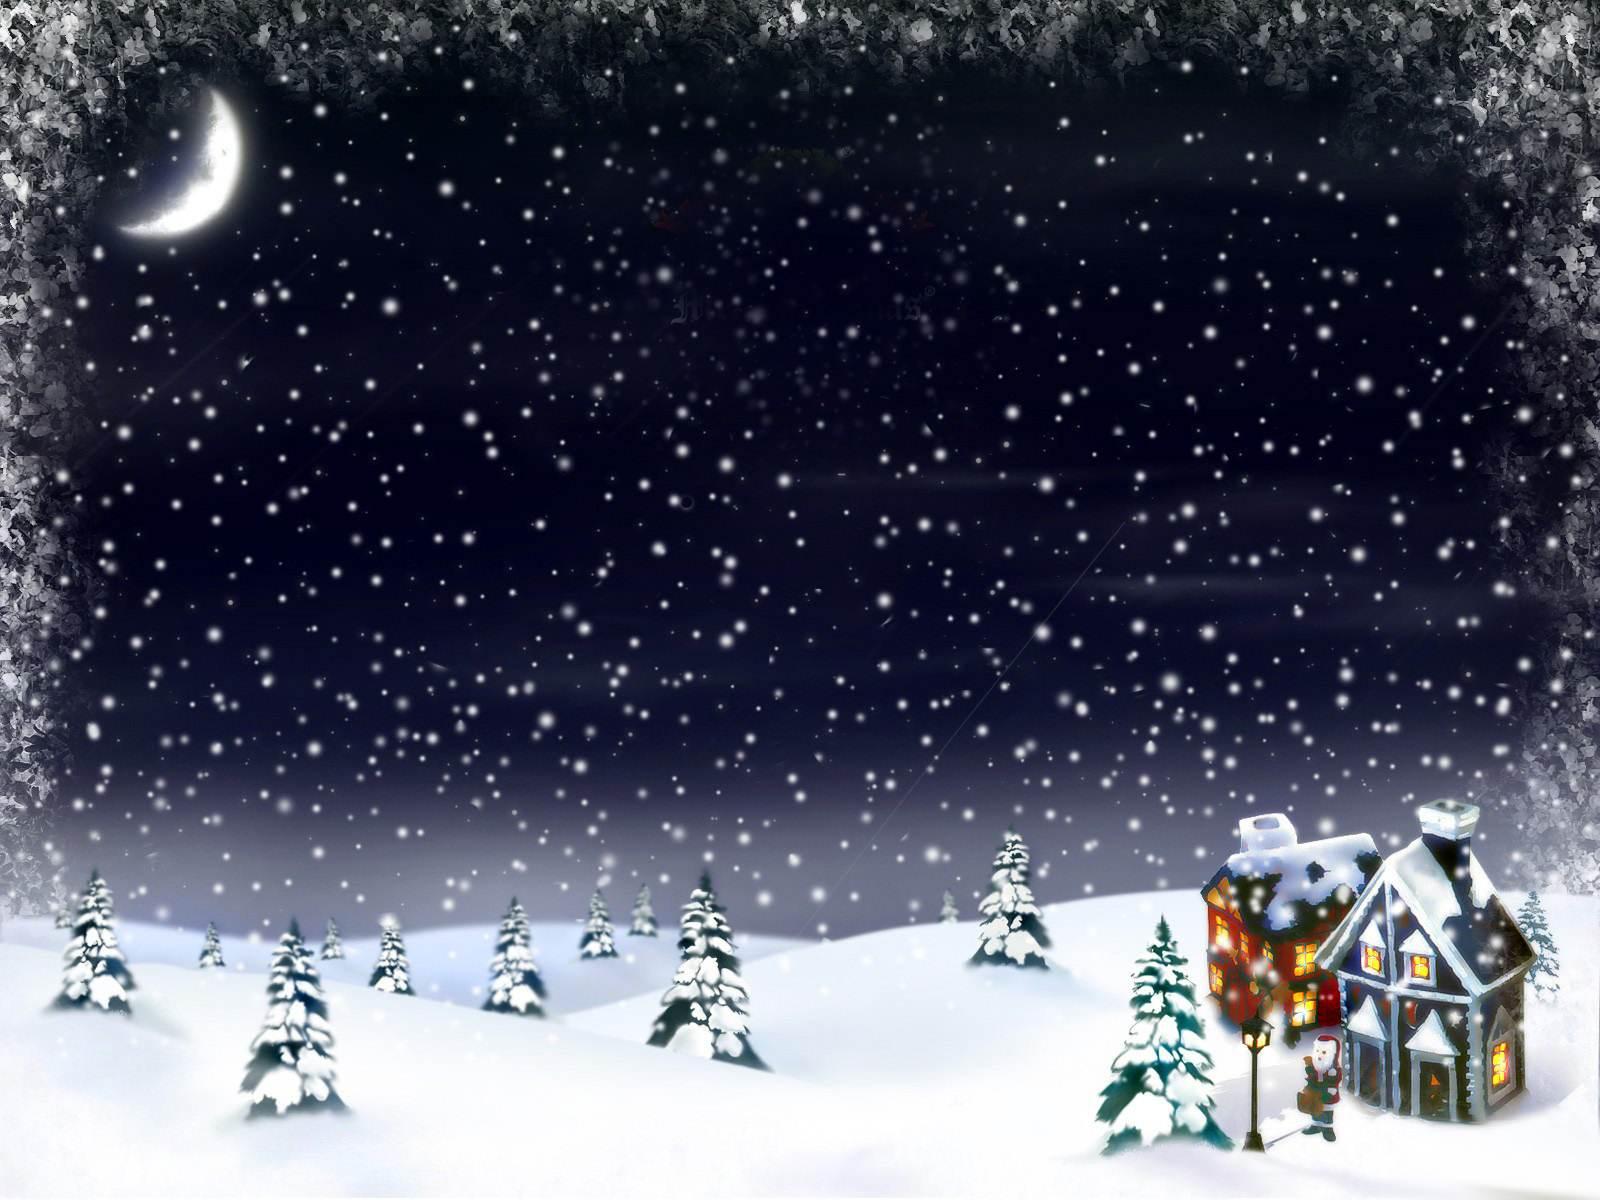 http://2.bp.blogspot.com/-bkDub8Ph8hM/UKobHyjOWzI/AAAAAAAACAs/o_e9jox8lnE/s1600/Christmas+Wallpaper+snow.jpg